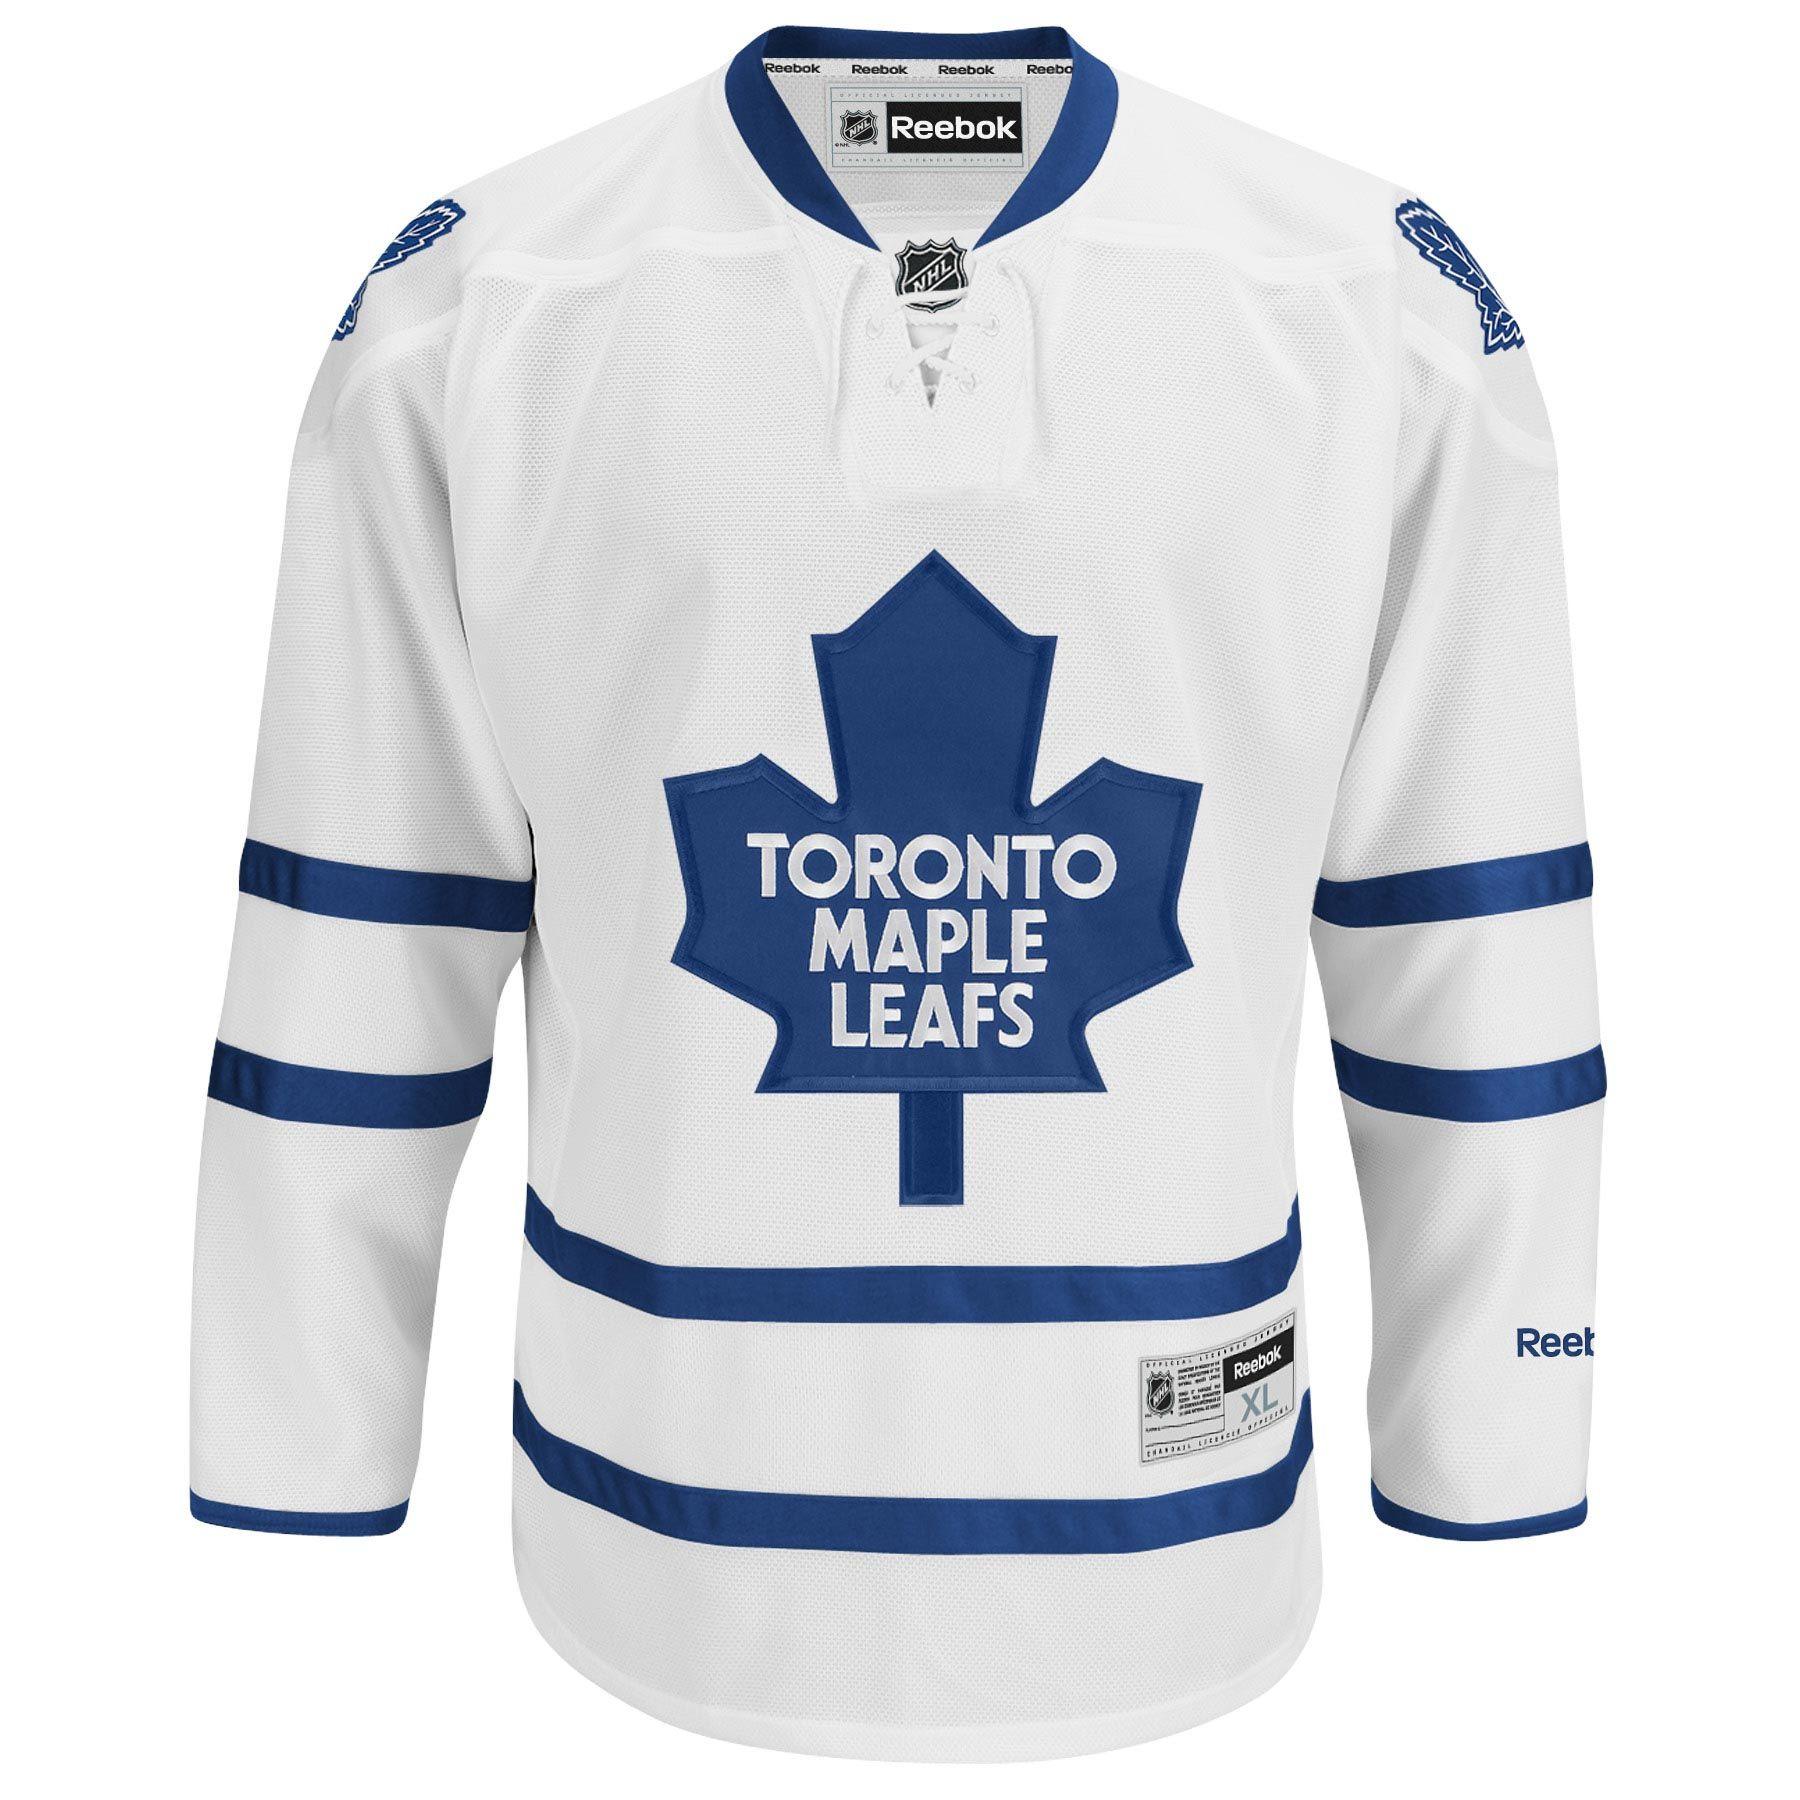 quality design e5d23 7c2b4 To Jerseys In Toronto Nhl Buy Where lockup.paganellisport.com